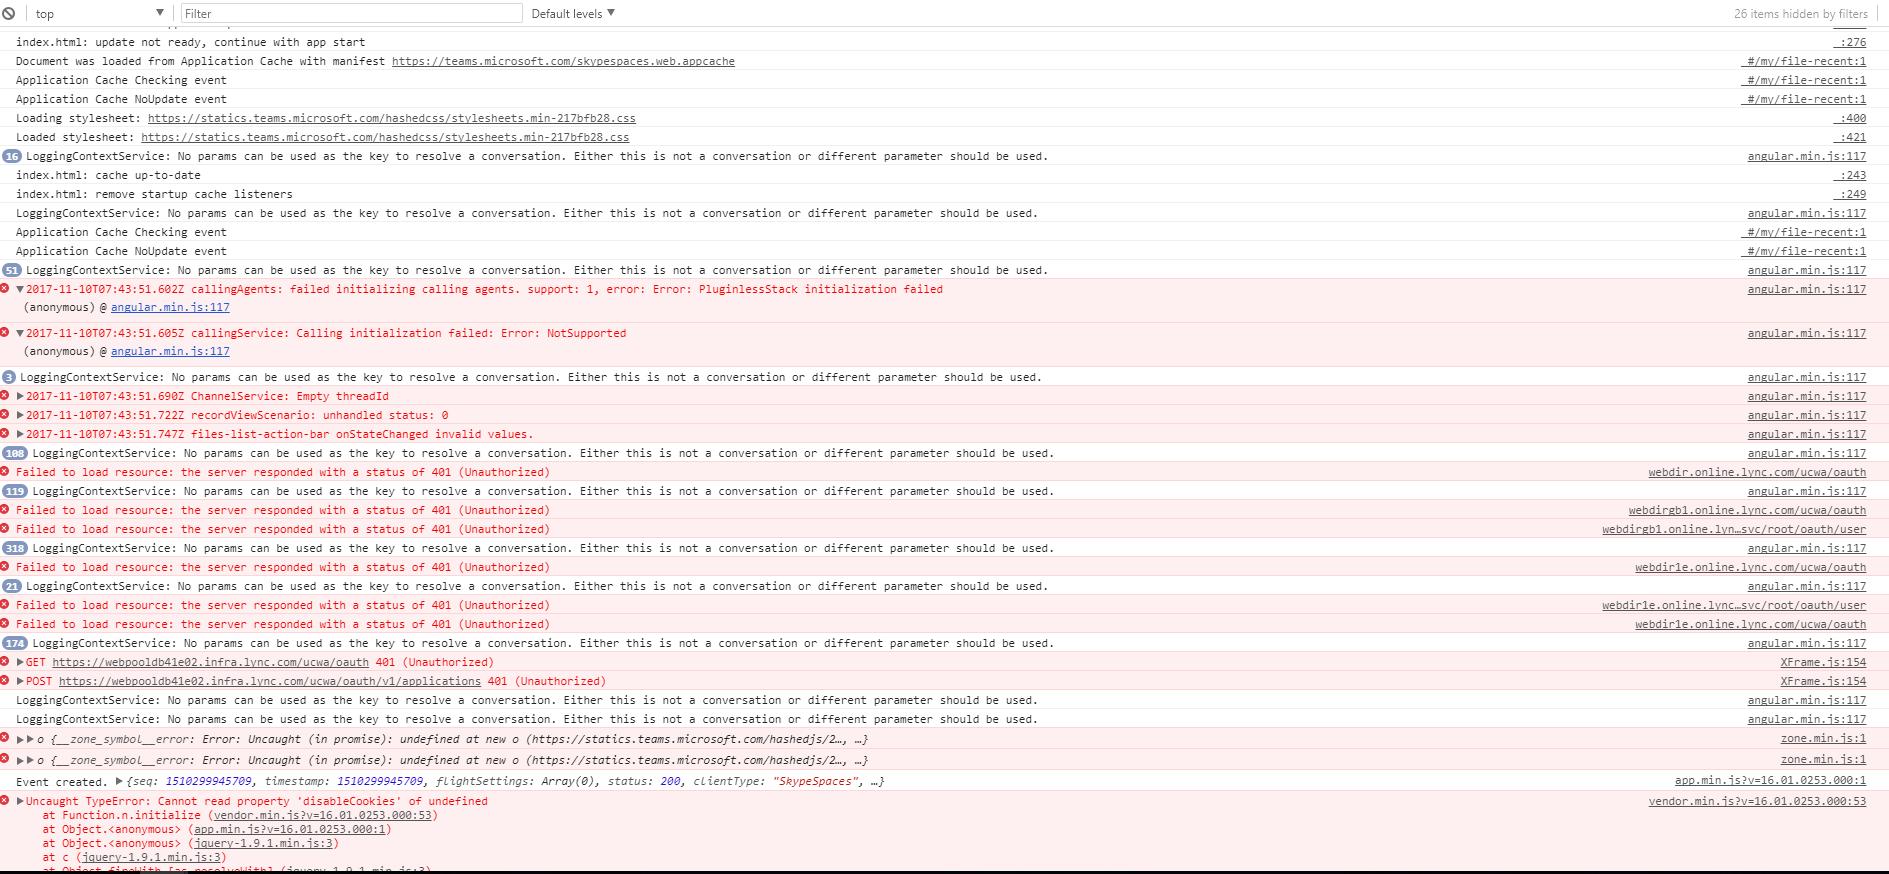 Incoming Webhook - MS Teams returned HTTP error 403